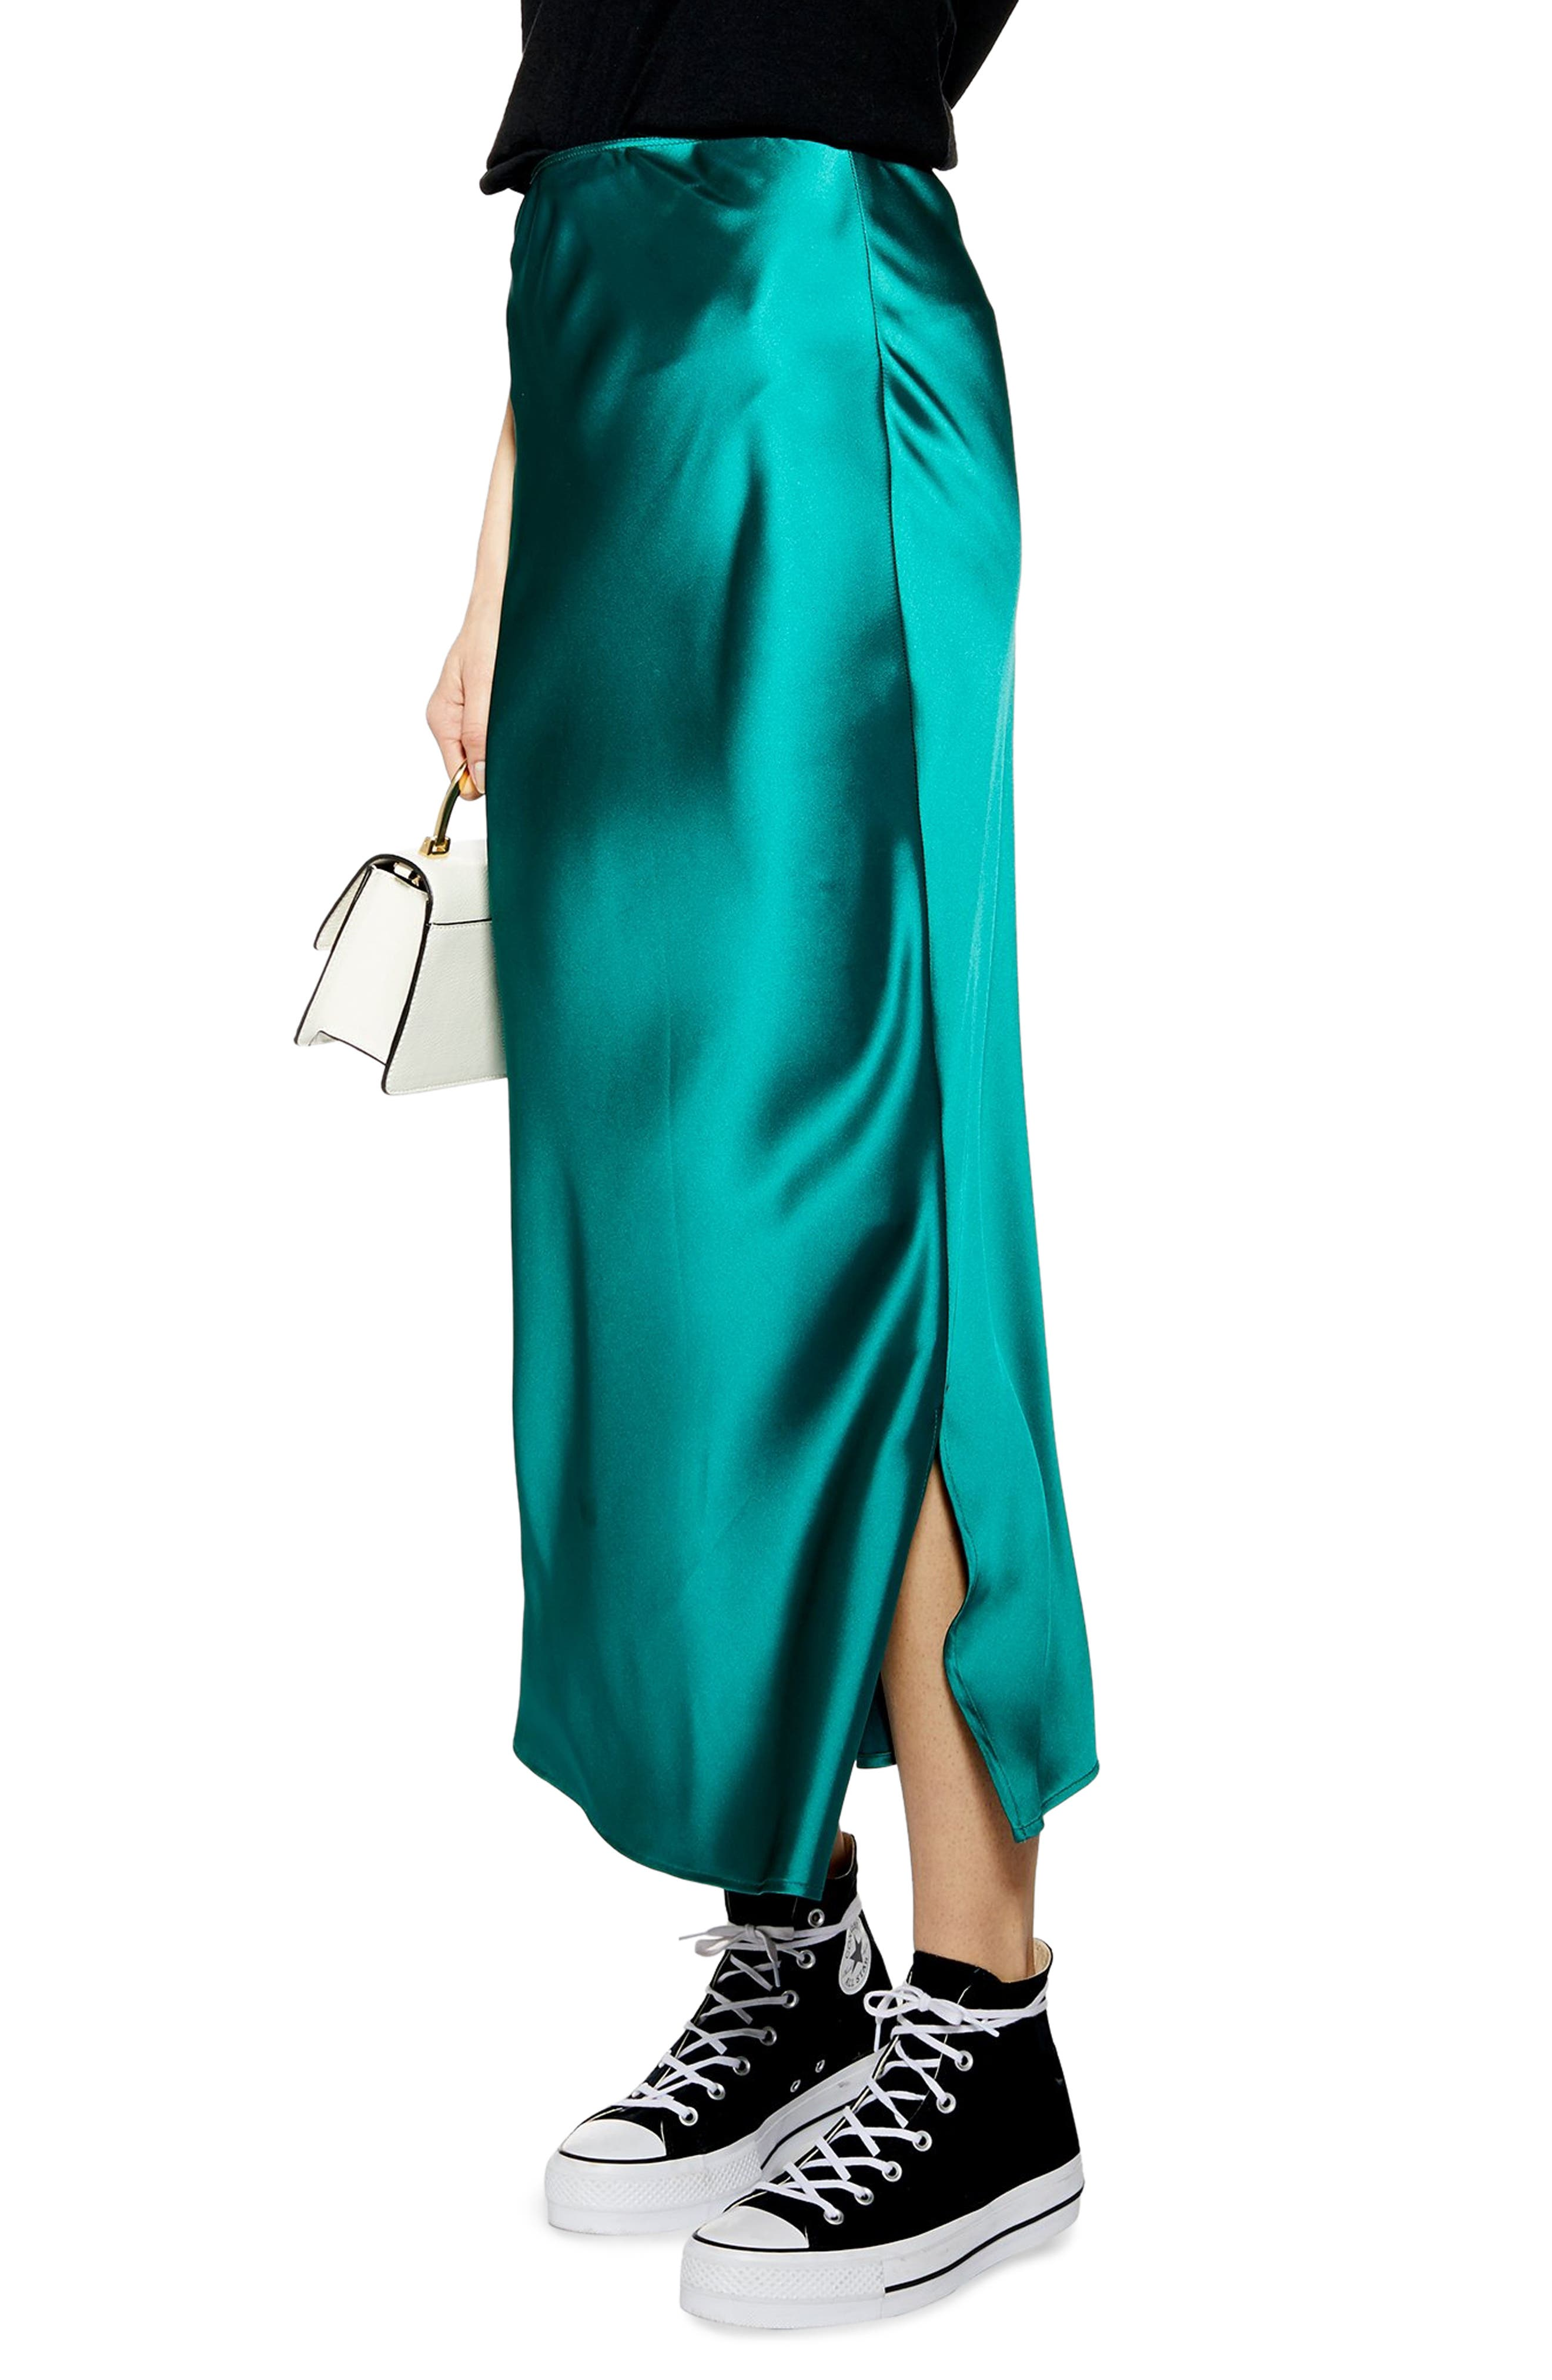 Topshop Split Side Bias Midi Skirt, US (fits like 2-4) - Green